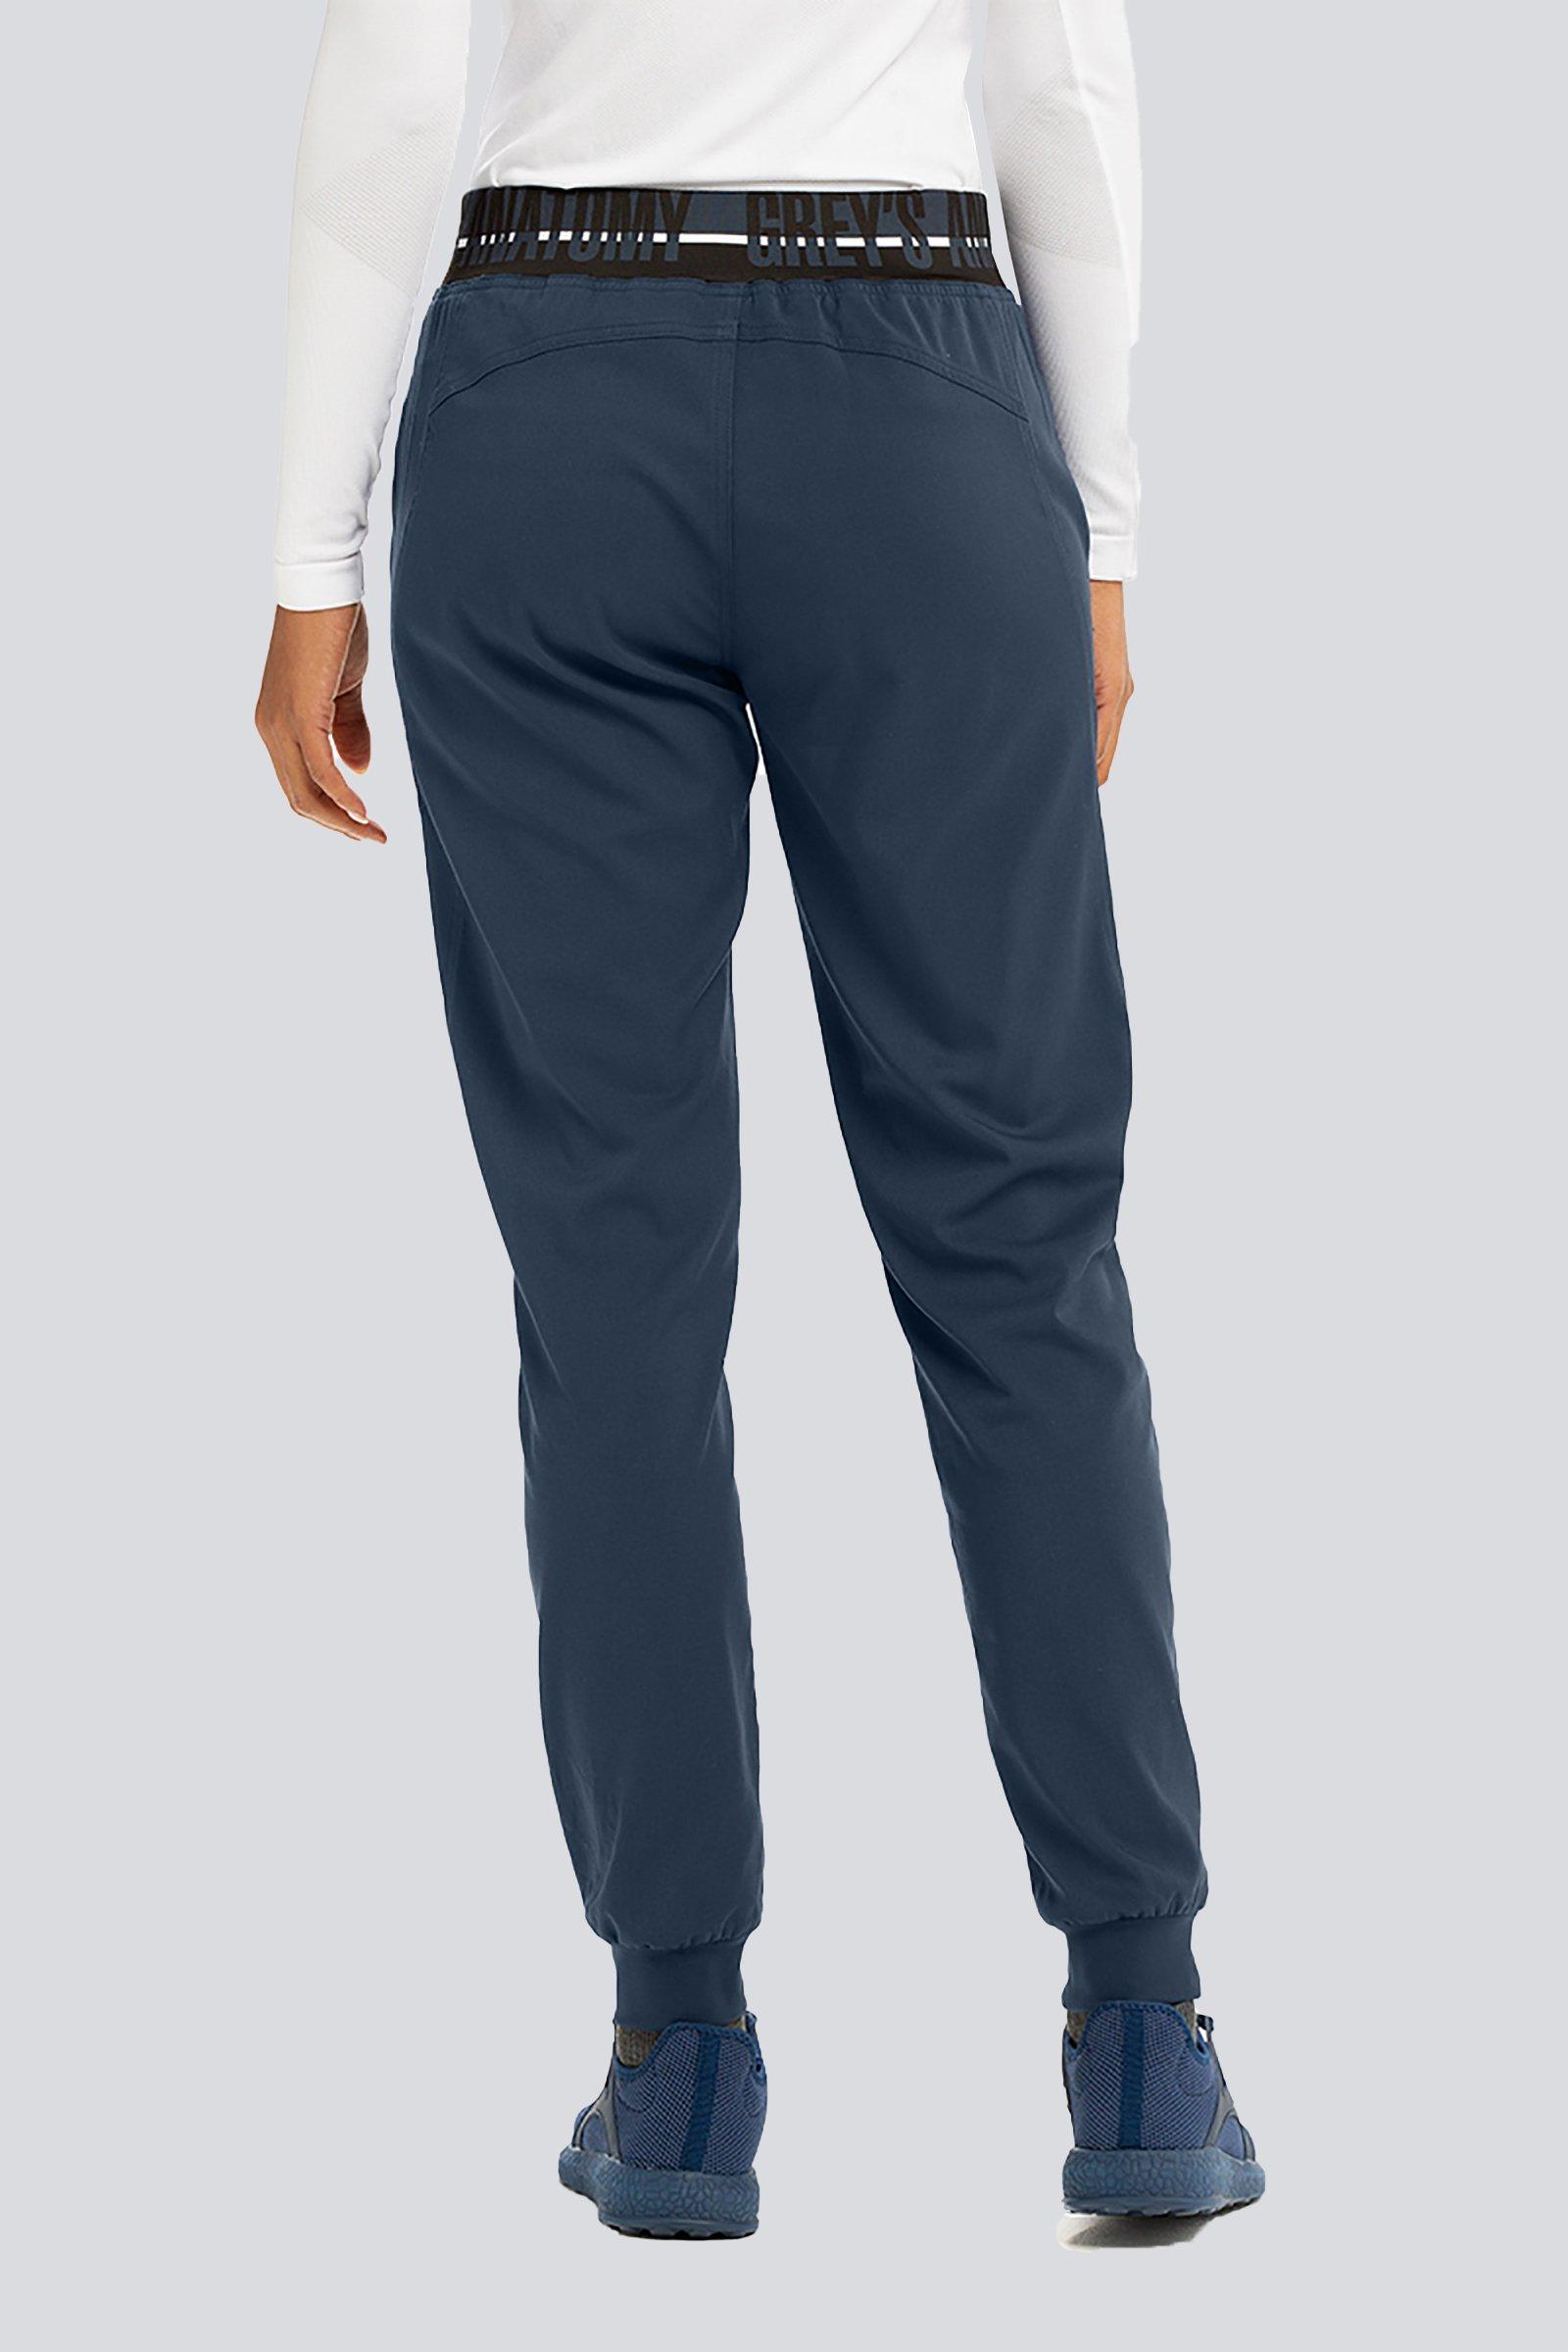 e7733e51 Spodnie medyczne damskie Barco Grey's Anatomy Stretch GVSP512 Steel